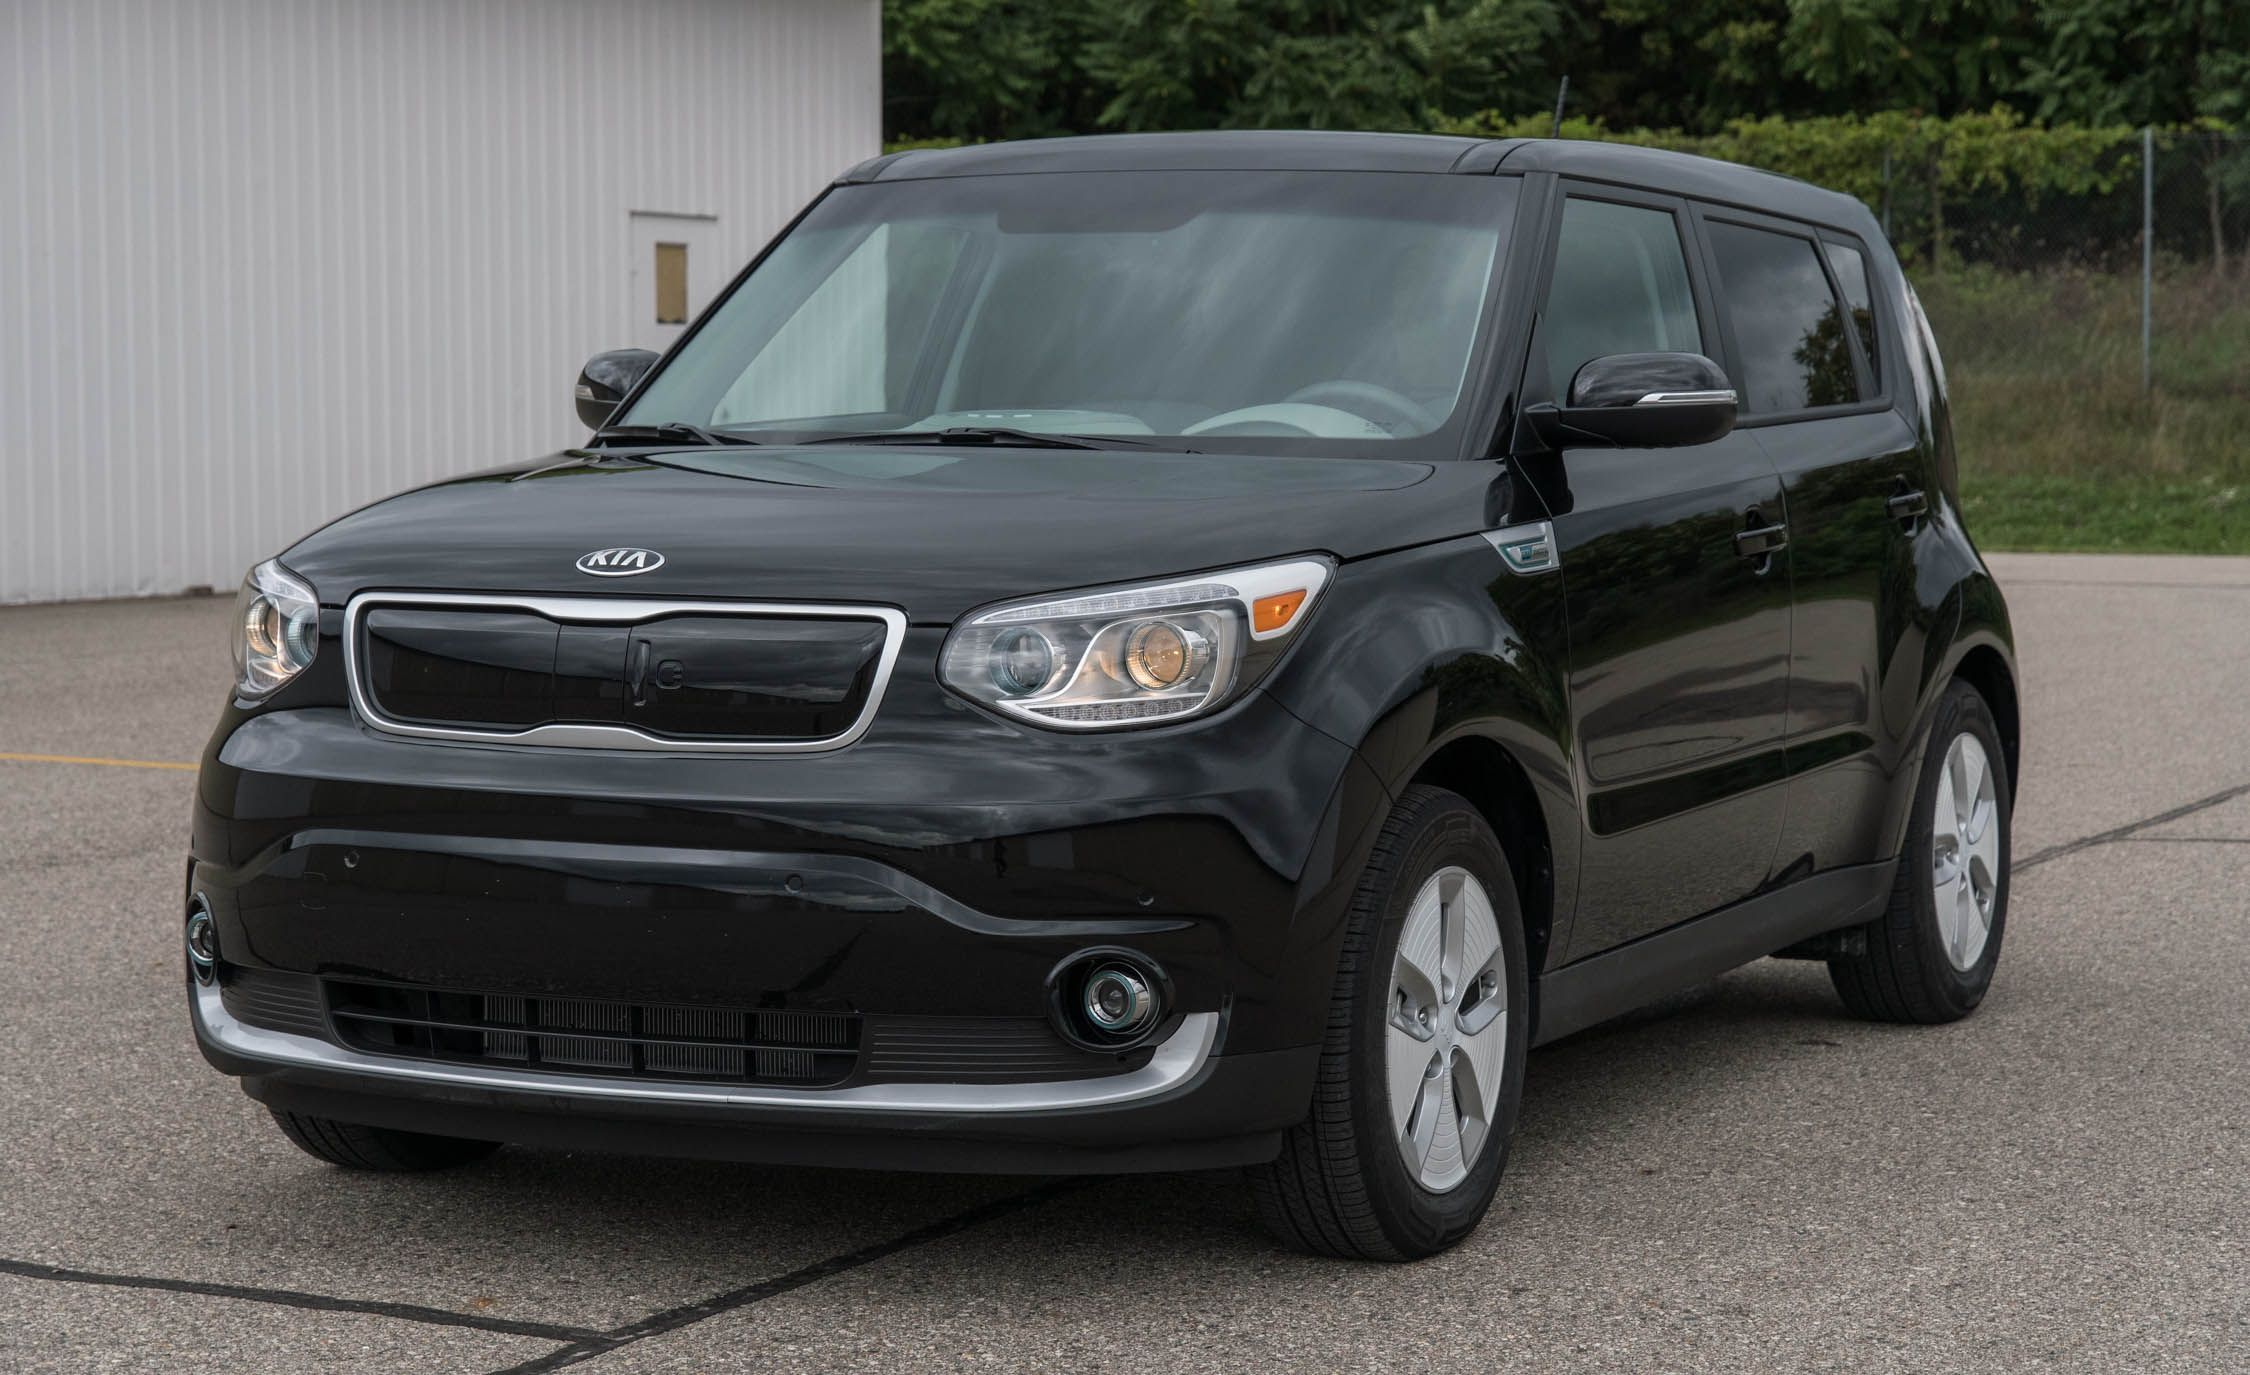 2020 Kia Soul Ev Reviews Price Photos And Specs Car Driver